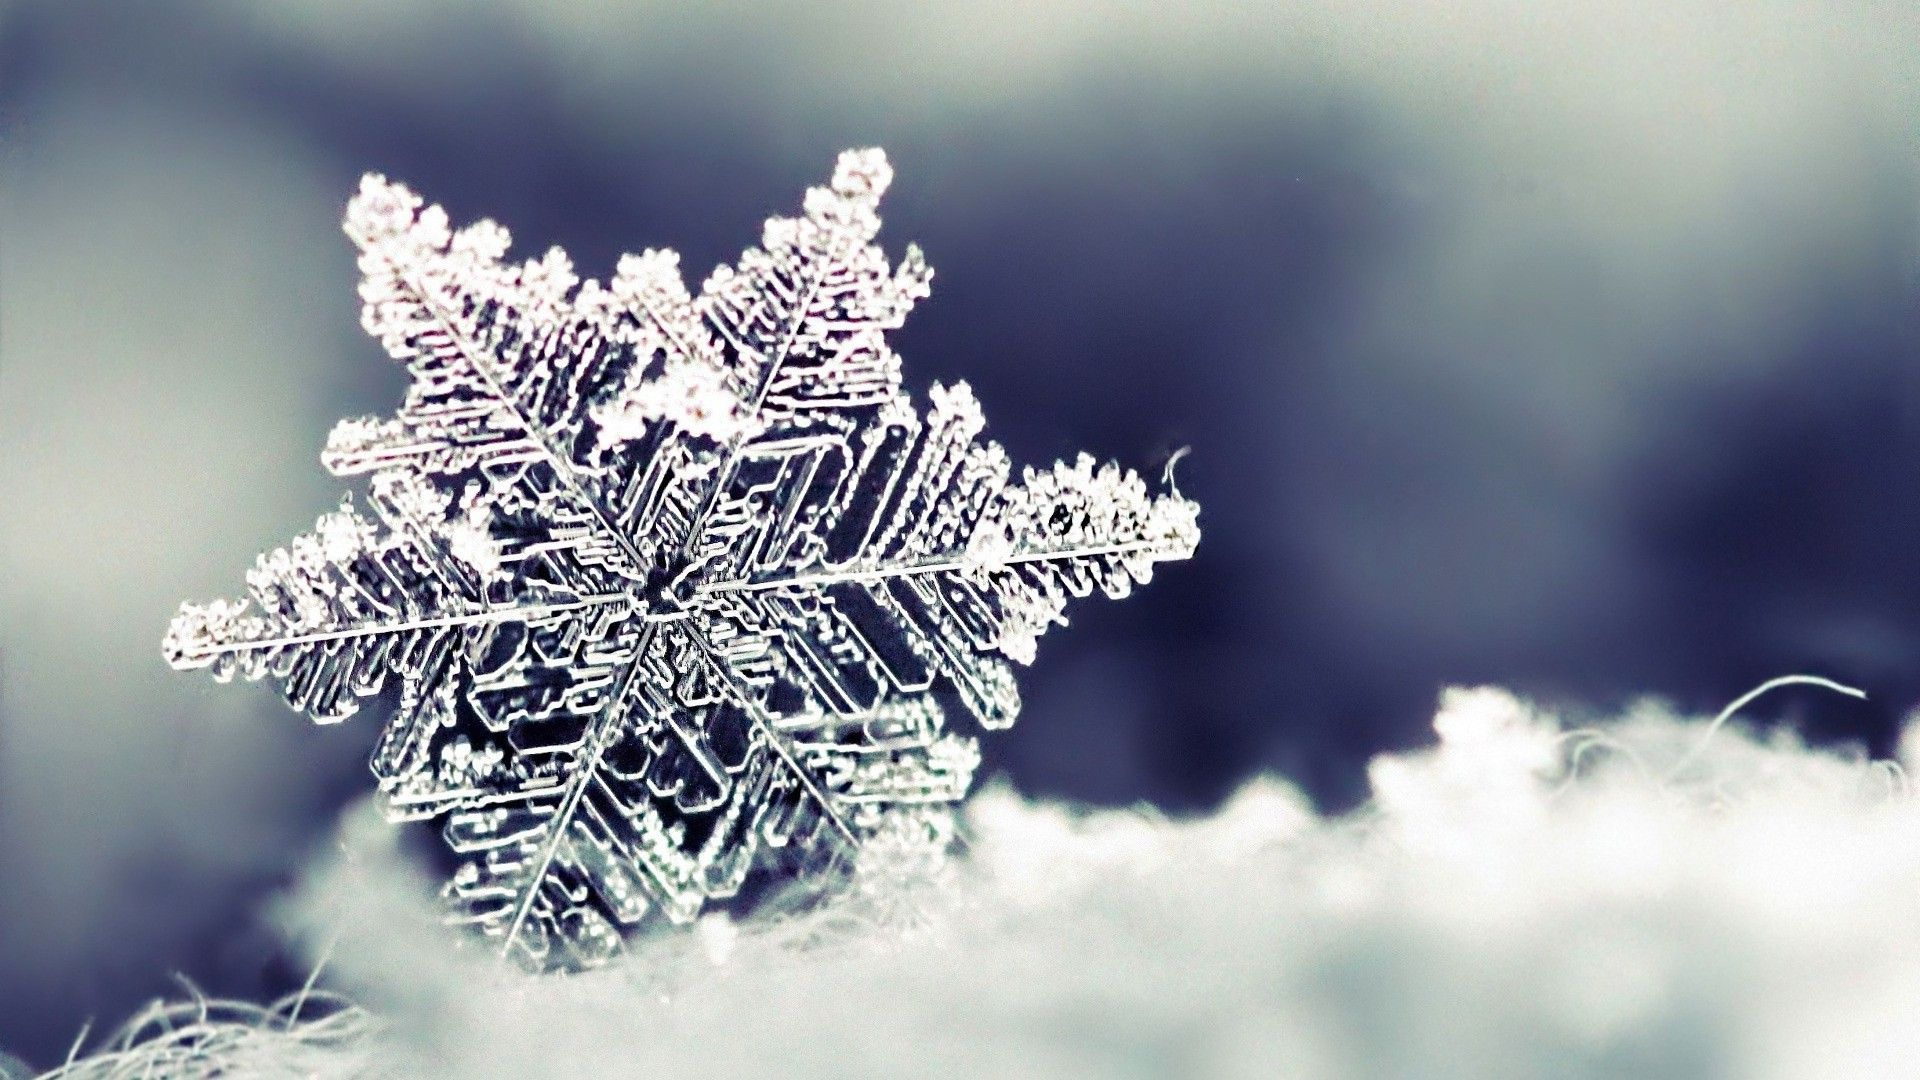 Snowflake Wallpaper Hd Images 3 HD Wallpapers Snowflake